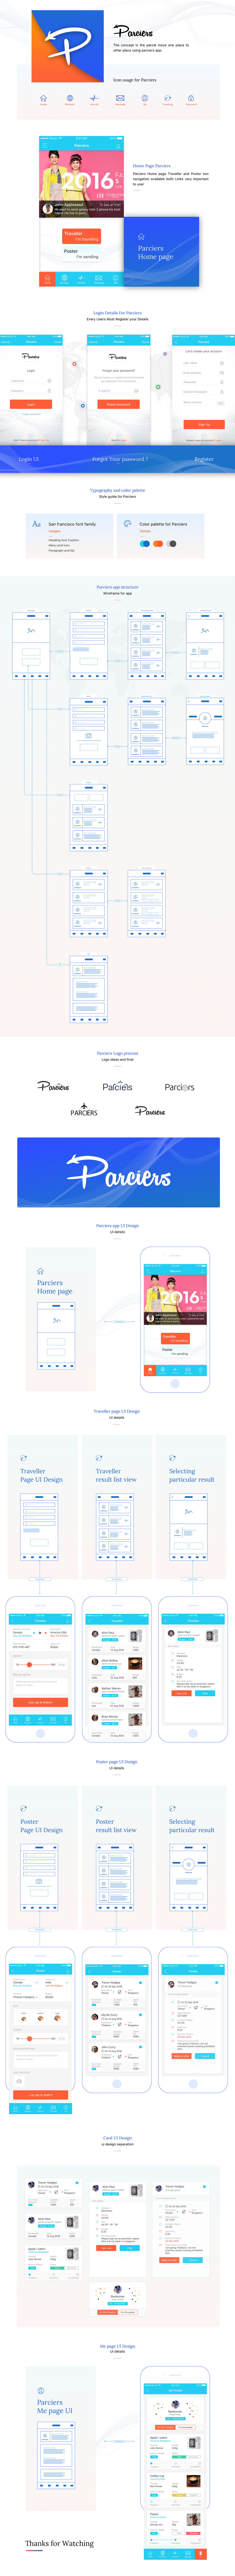 iOS Travel app Mobile design - UI/UX Card ui Freebies on Behance